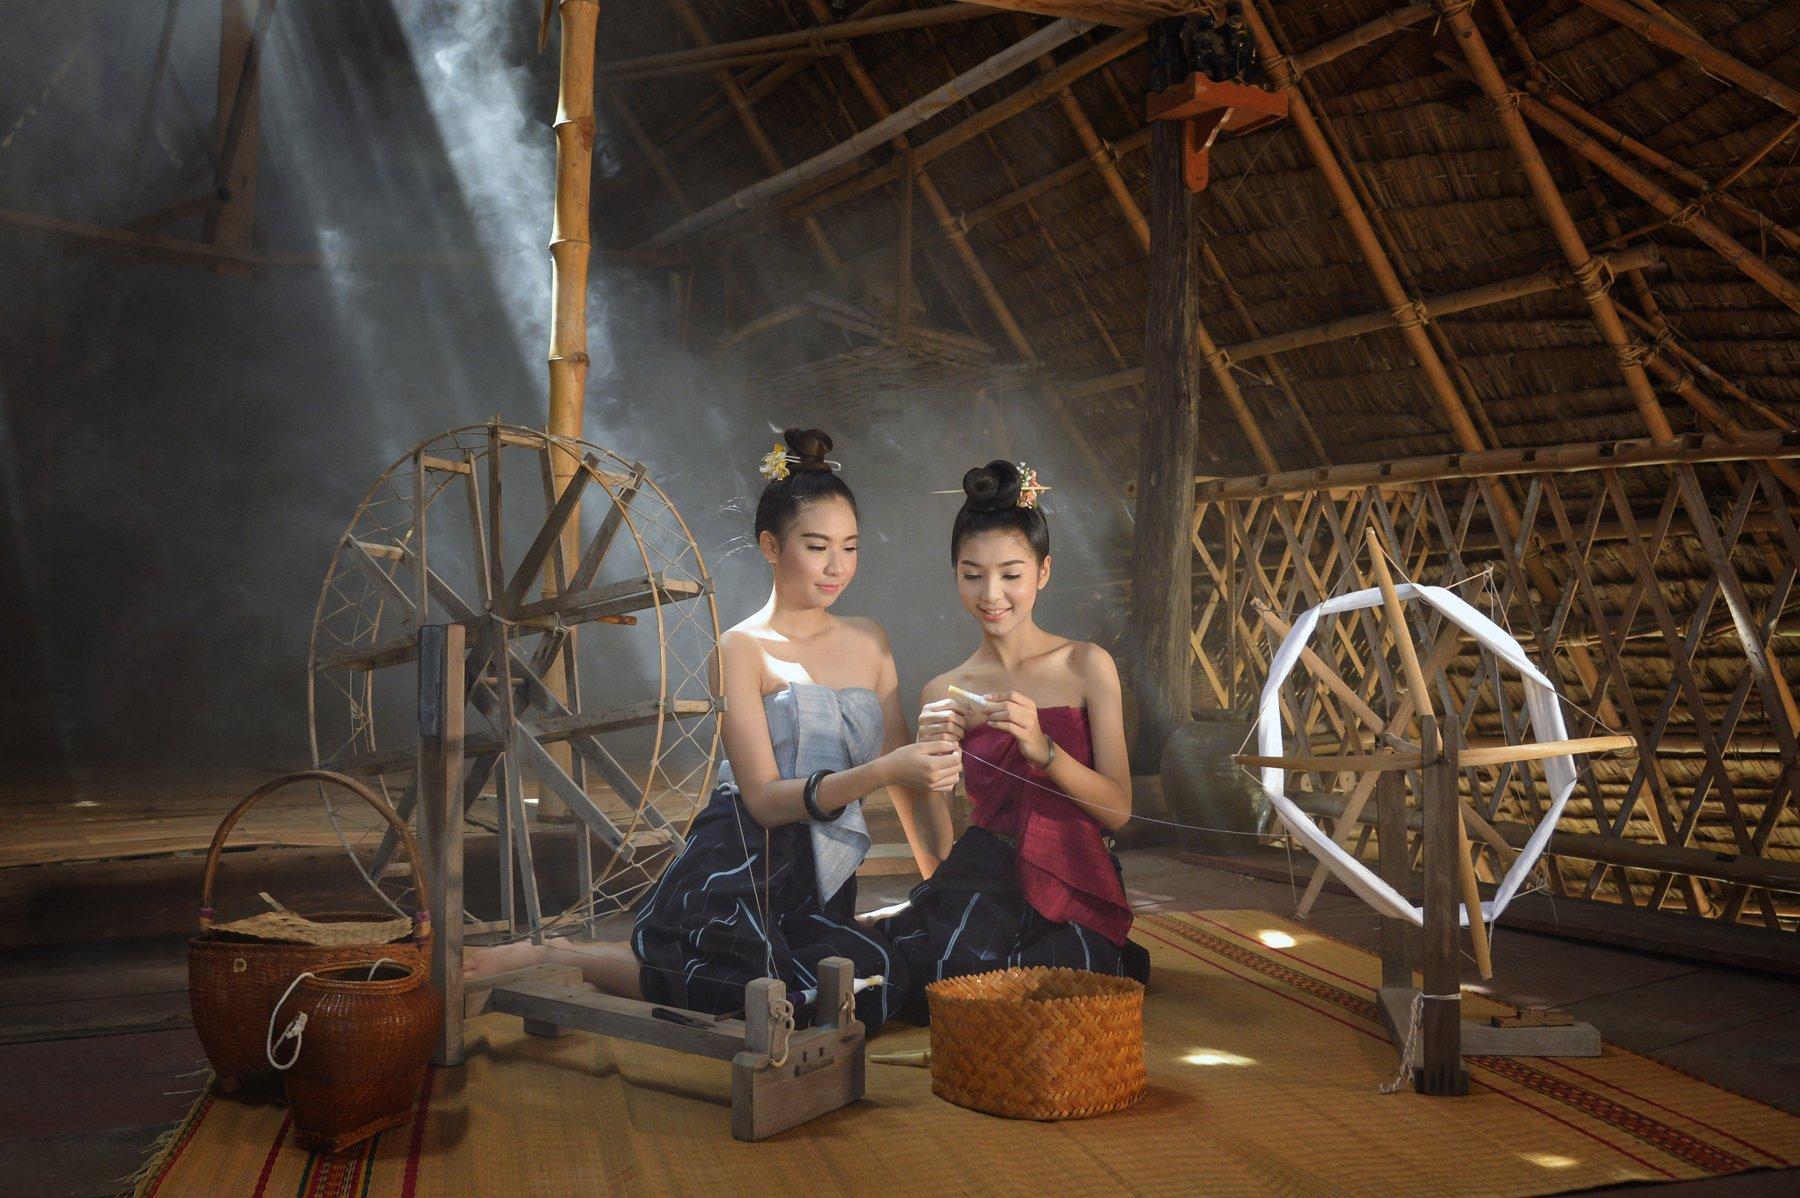 Asia, Asian, Beautiful, Culture, Dress, Thai, Thailand, Traditional, Travel, Saravut Whanset